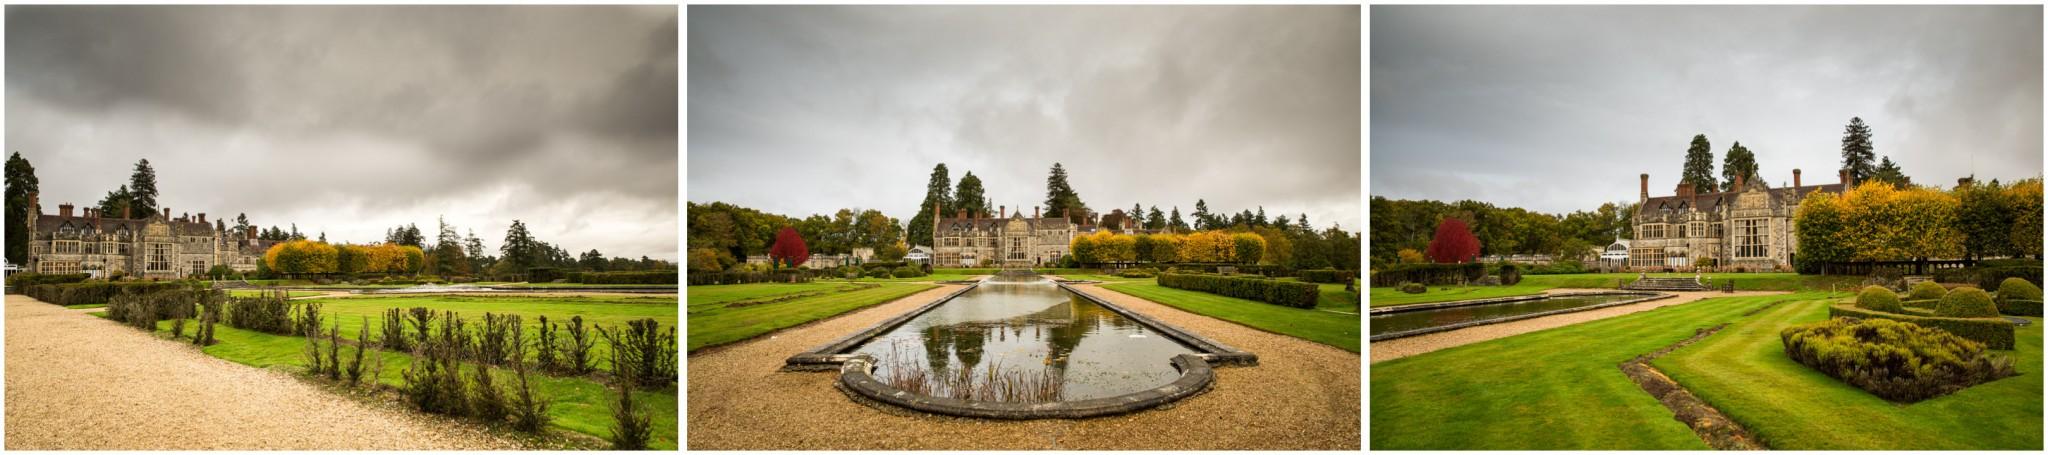 Rhinefield House Wedding Gardens